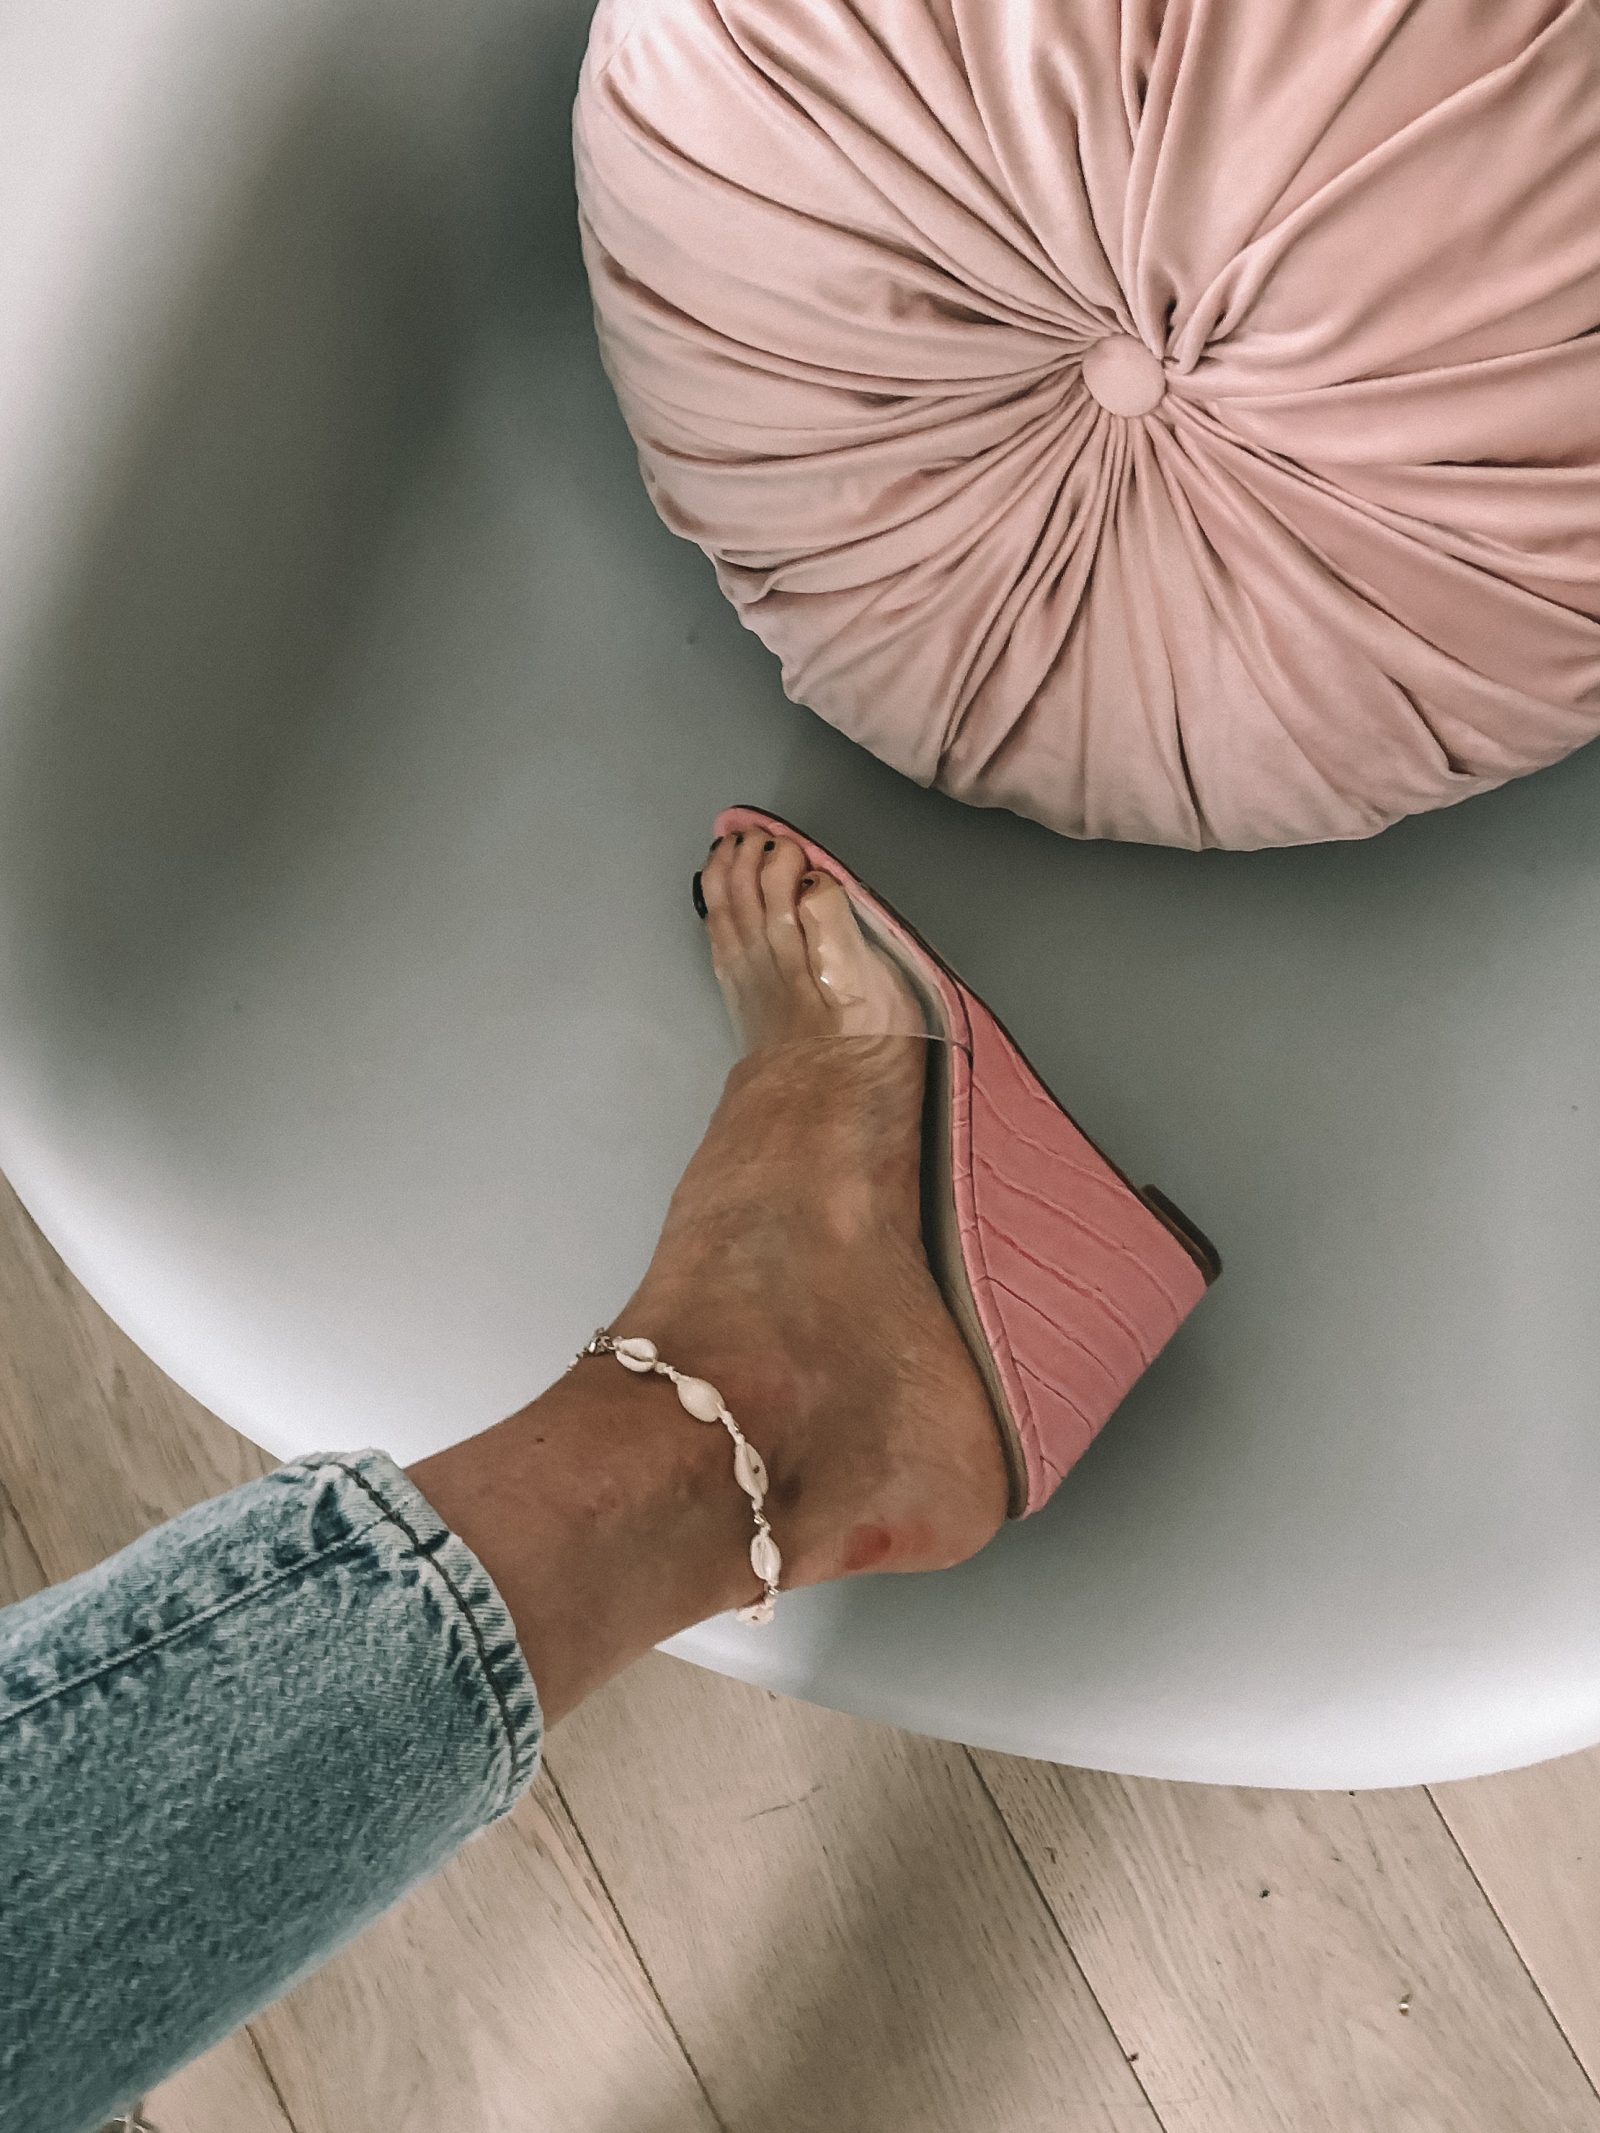 REVOLVE PVC Shoes - Pink Wedges